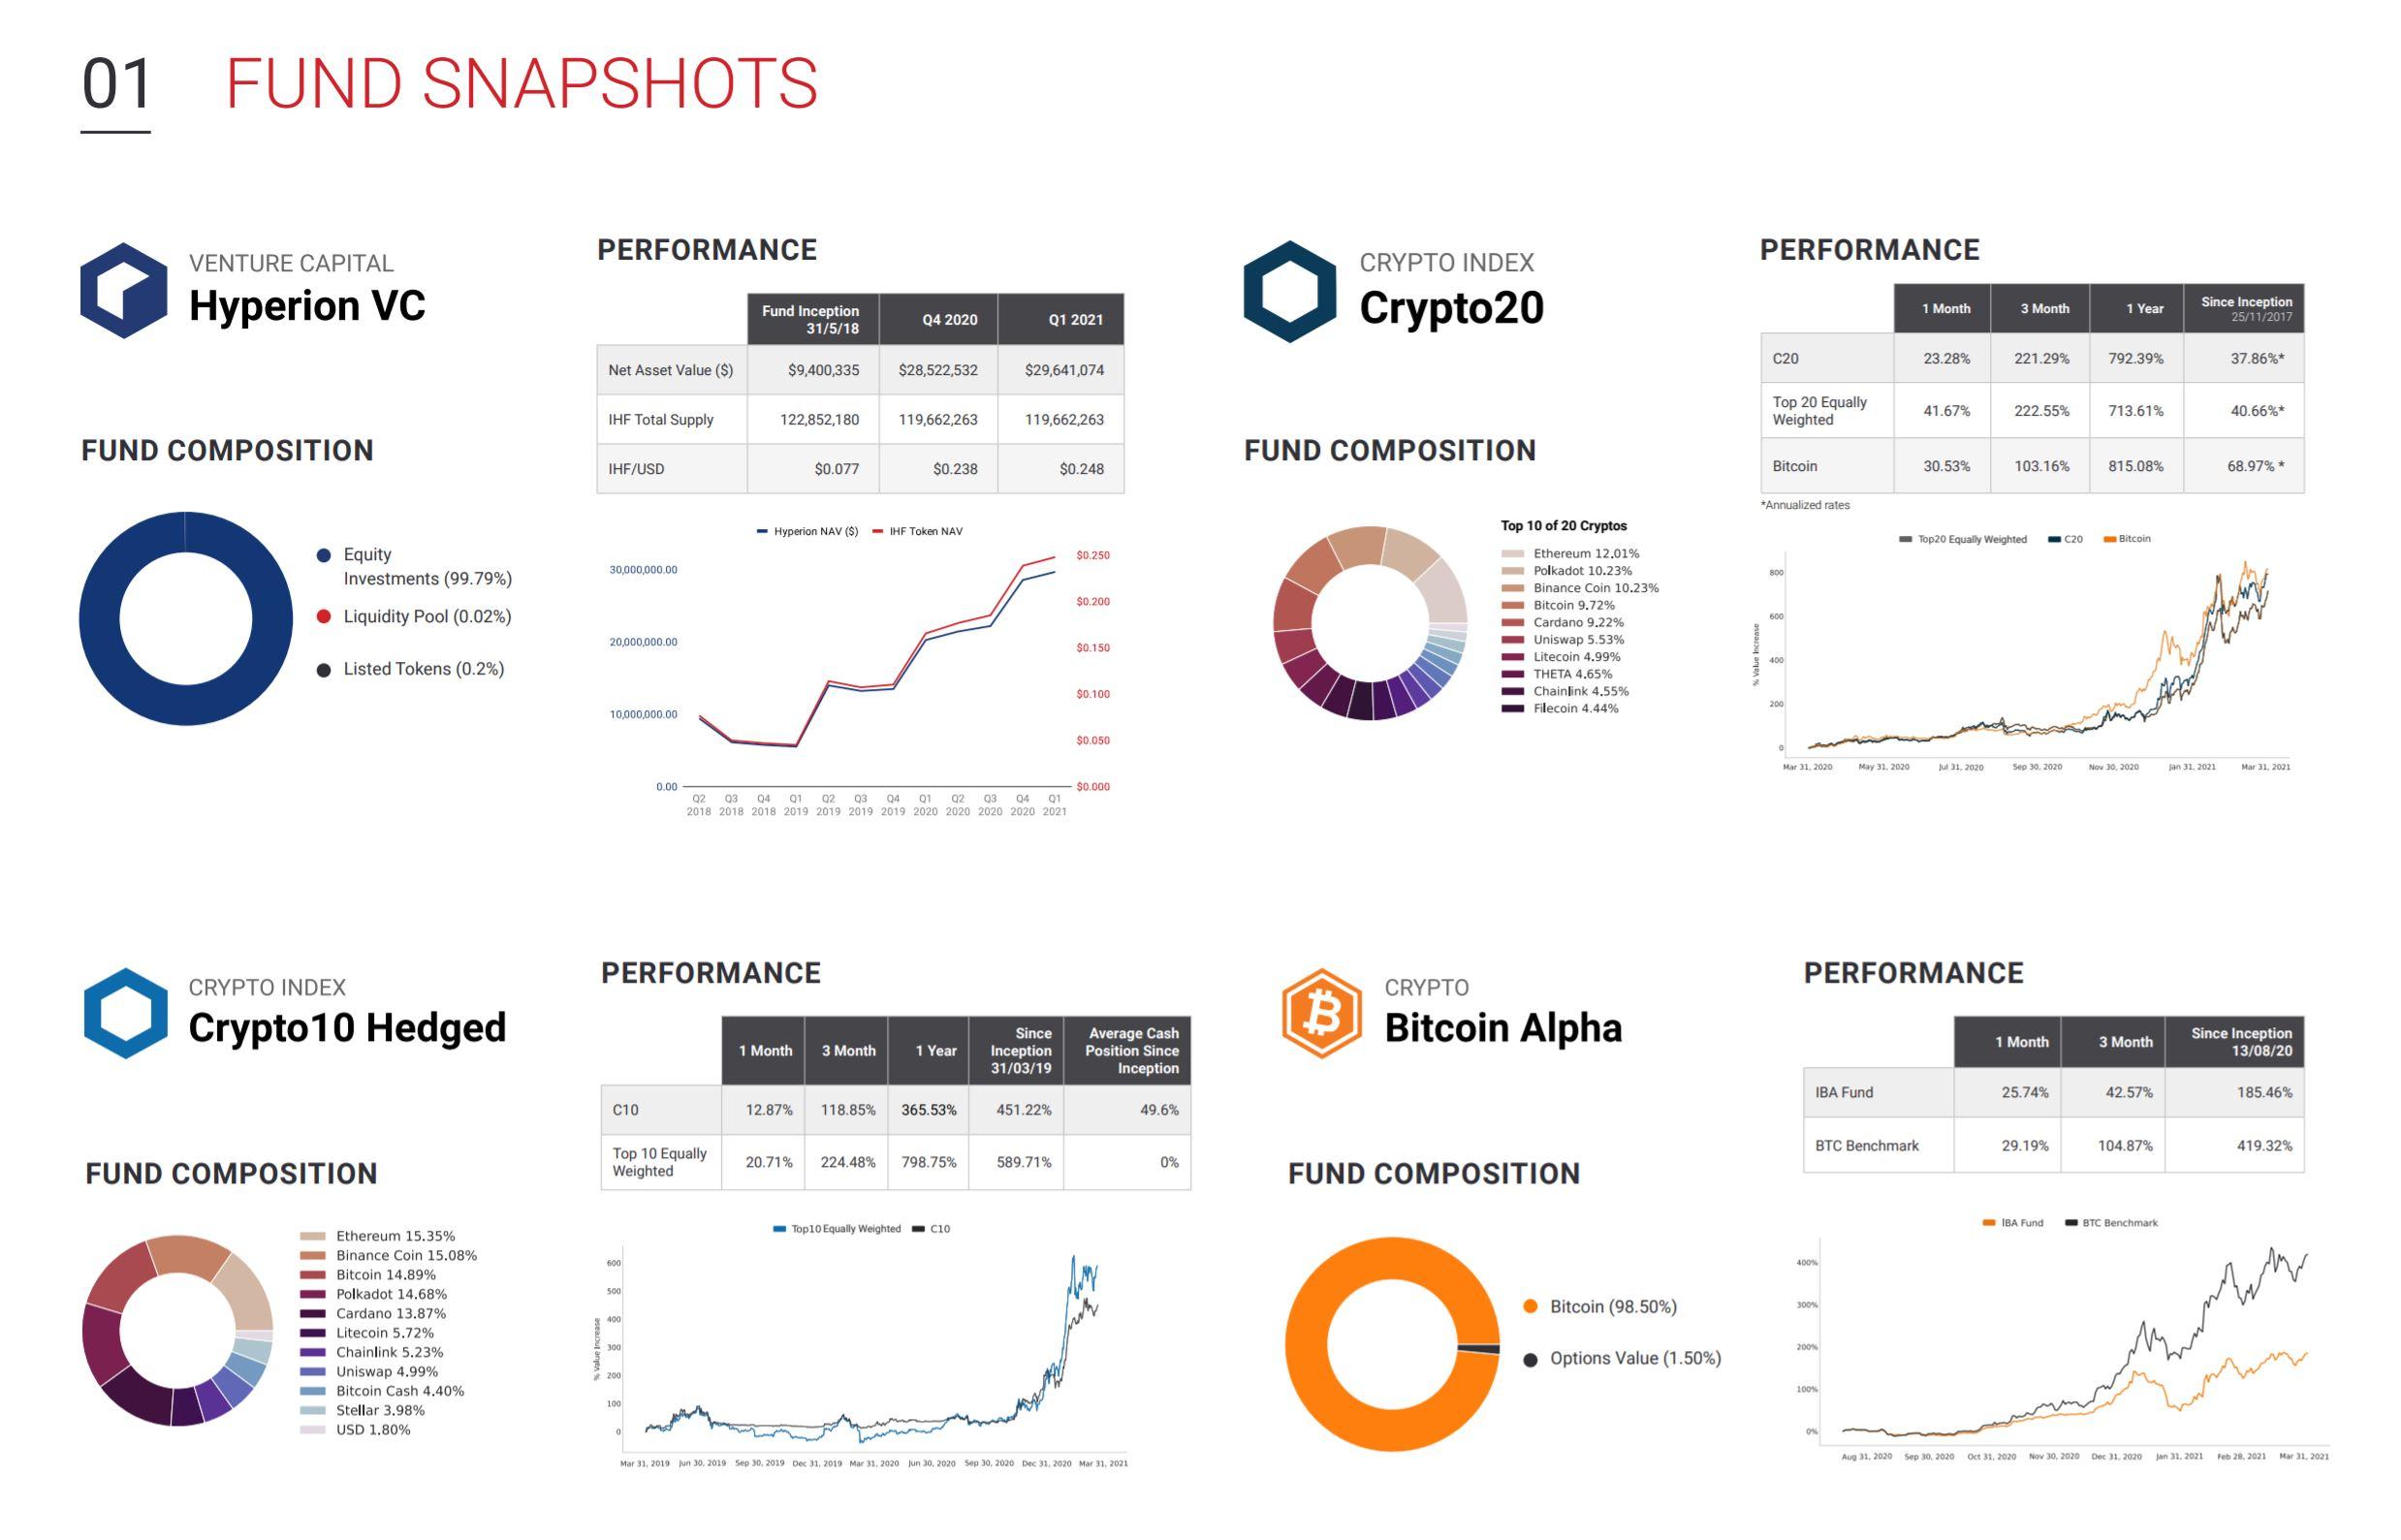 Crypto 20 Fund Snapshot